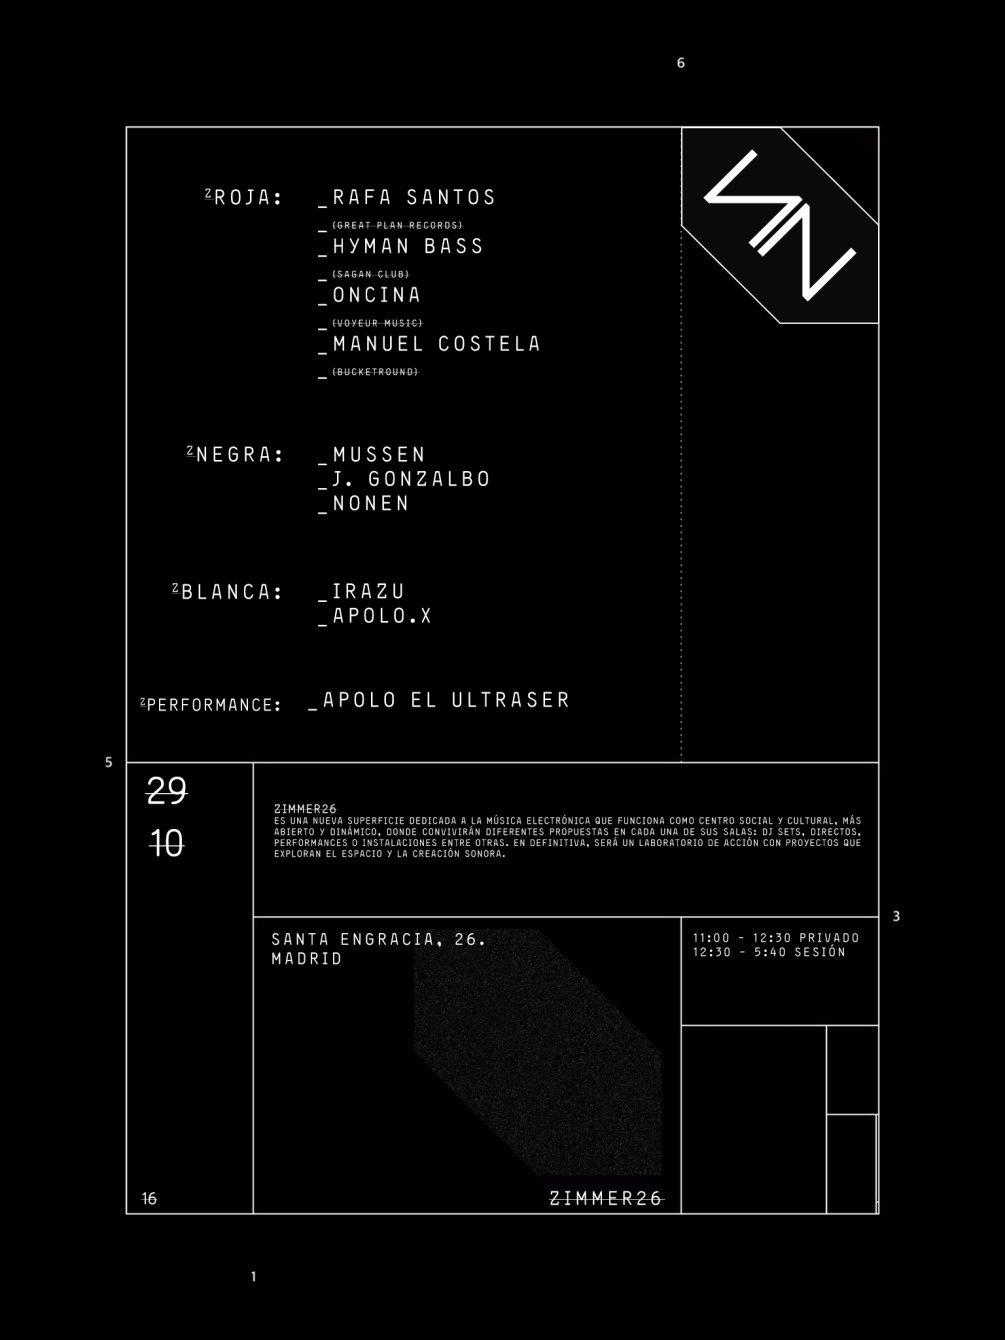 Zimmer26 / Sab29oct - Flyer front